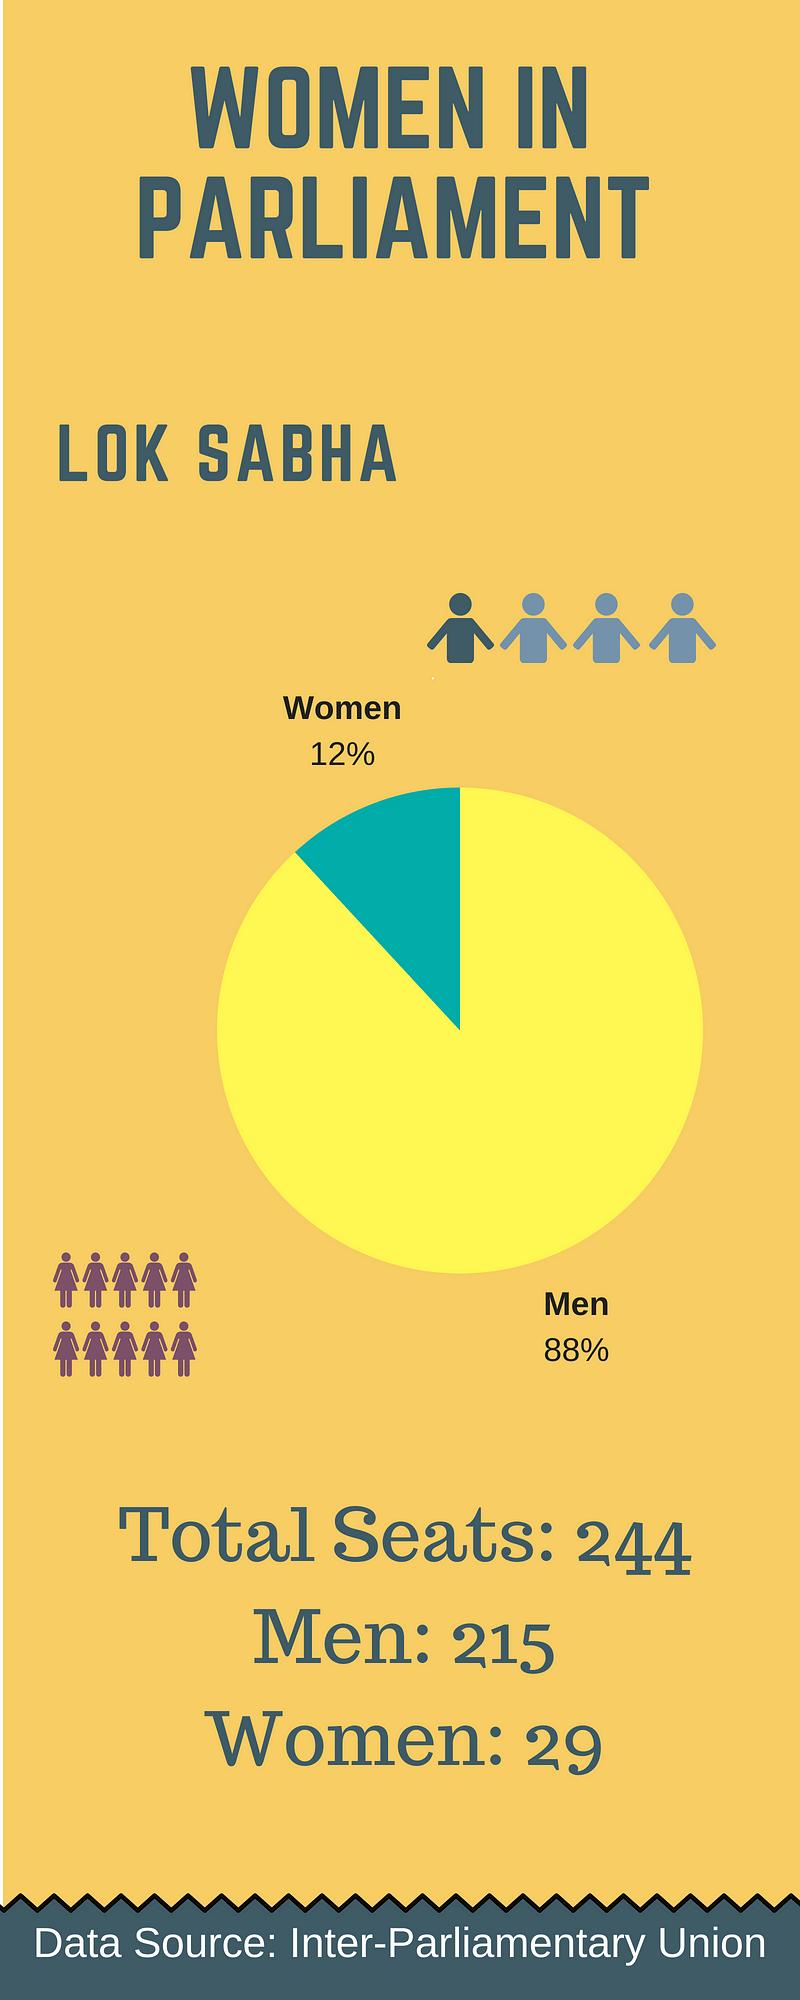 Data: June 2018 Inter-Parliamentary Union survey.